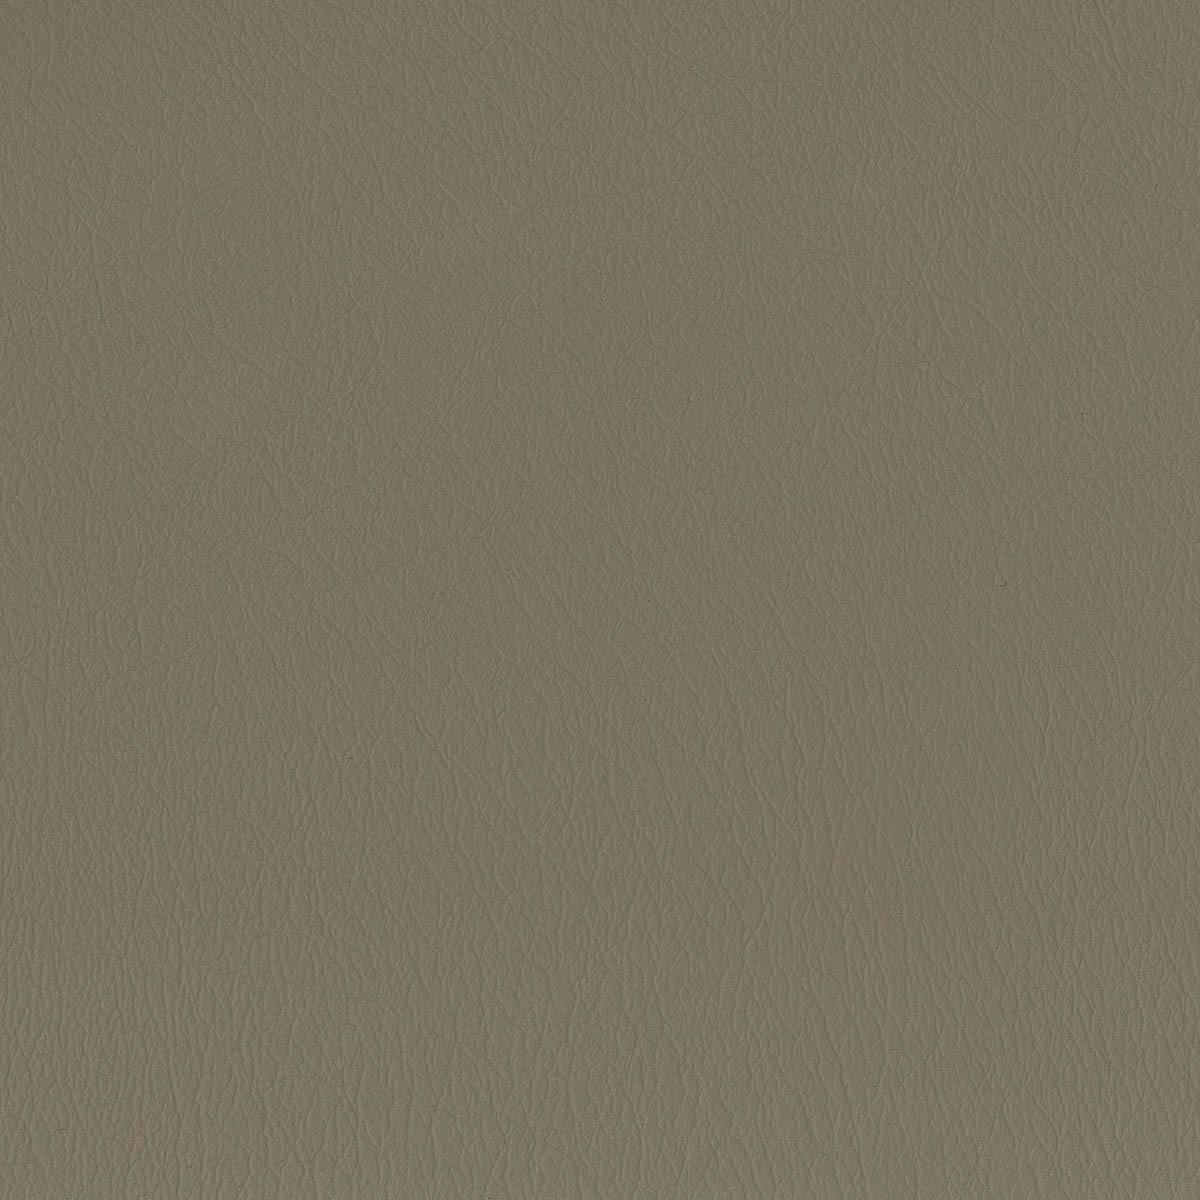 Gold Cuir Beige - MA6